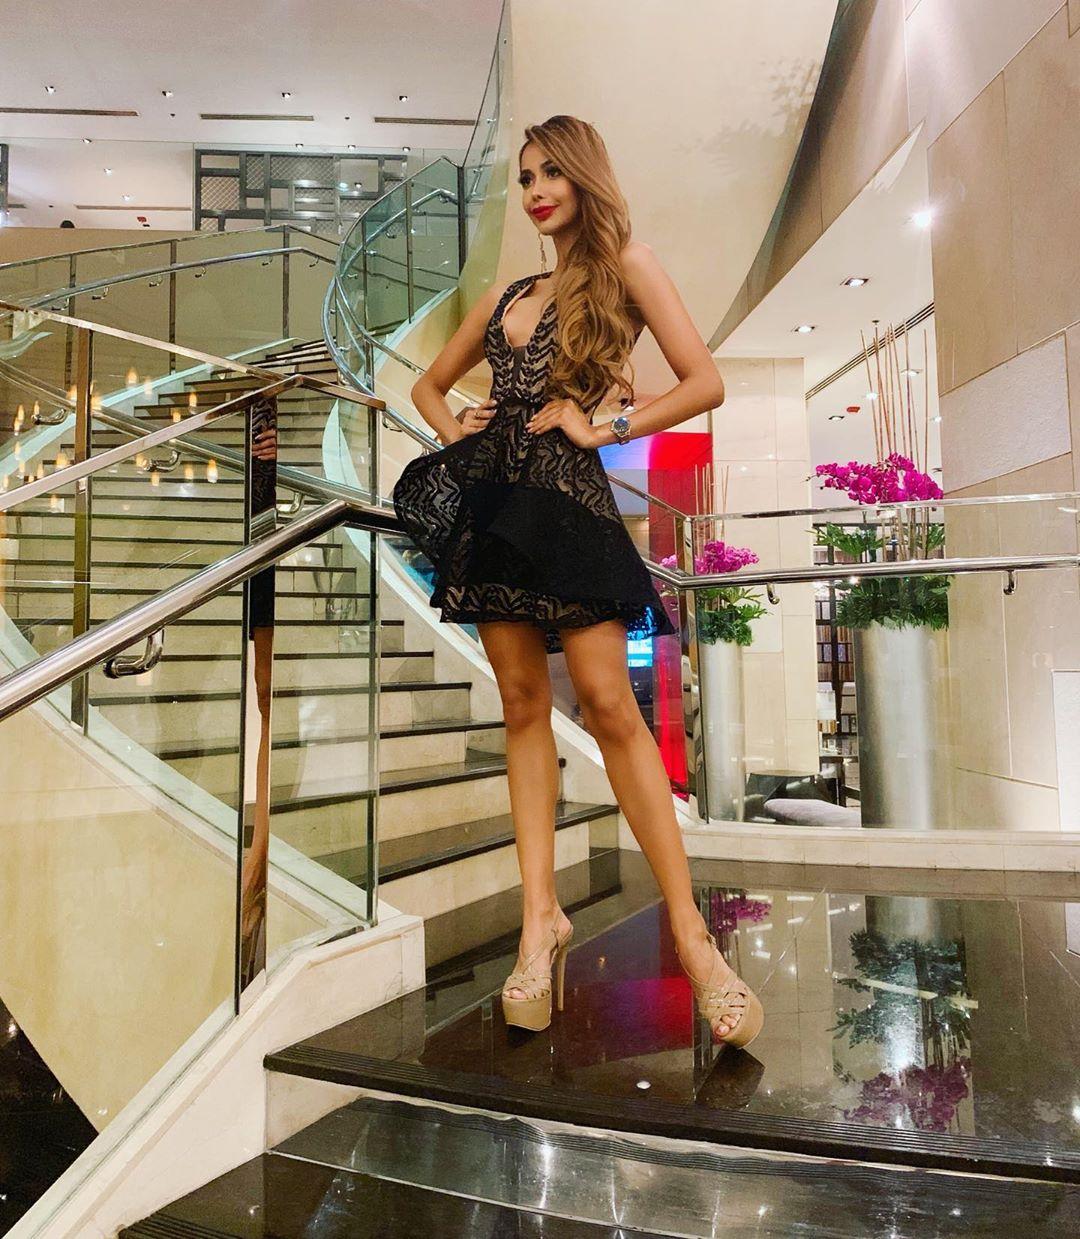 alejandra rodriguez osorio, miss asia pacific colombia 2019. - Página 3 70601610